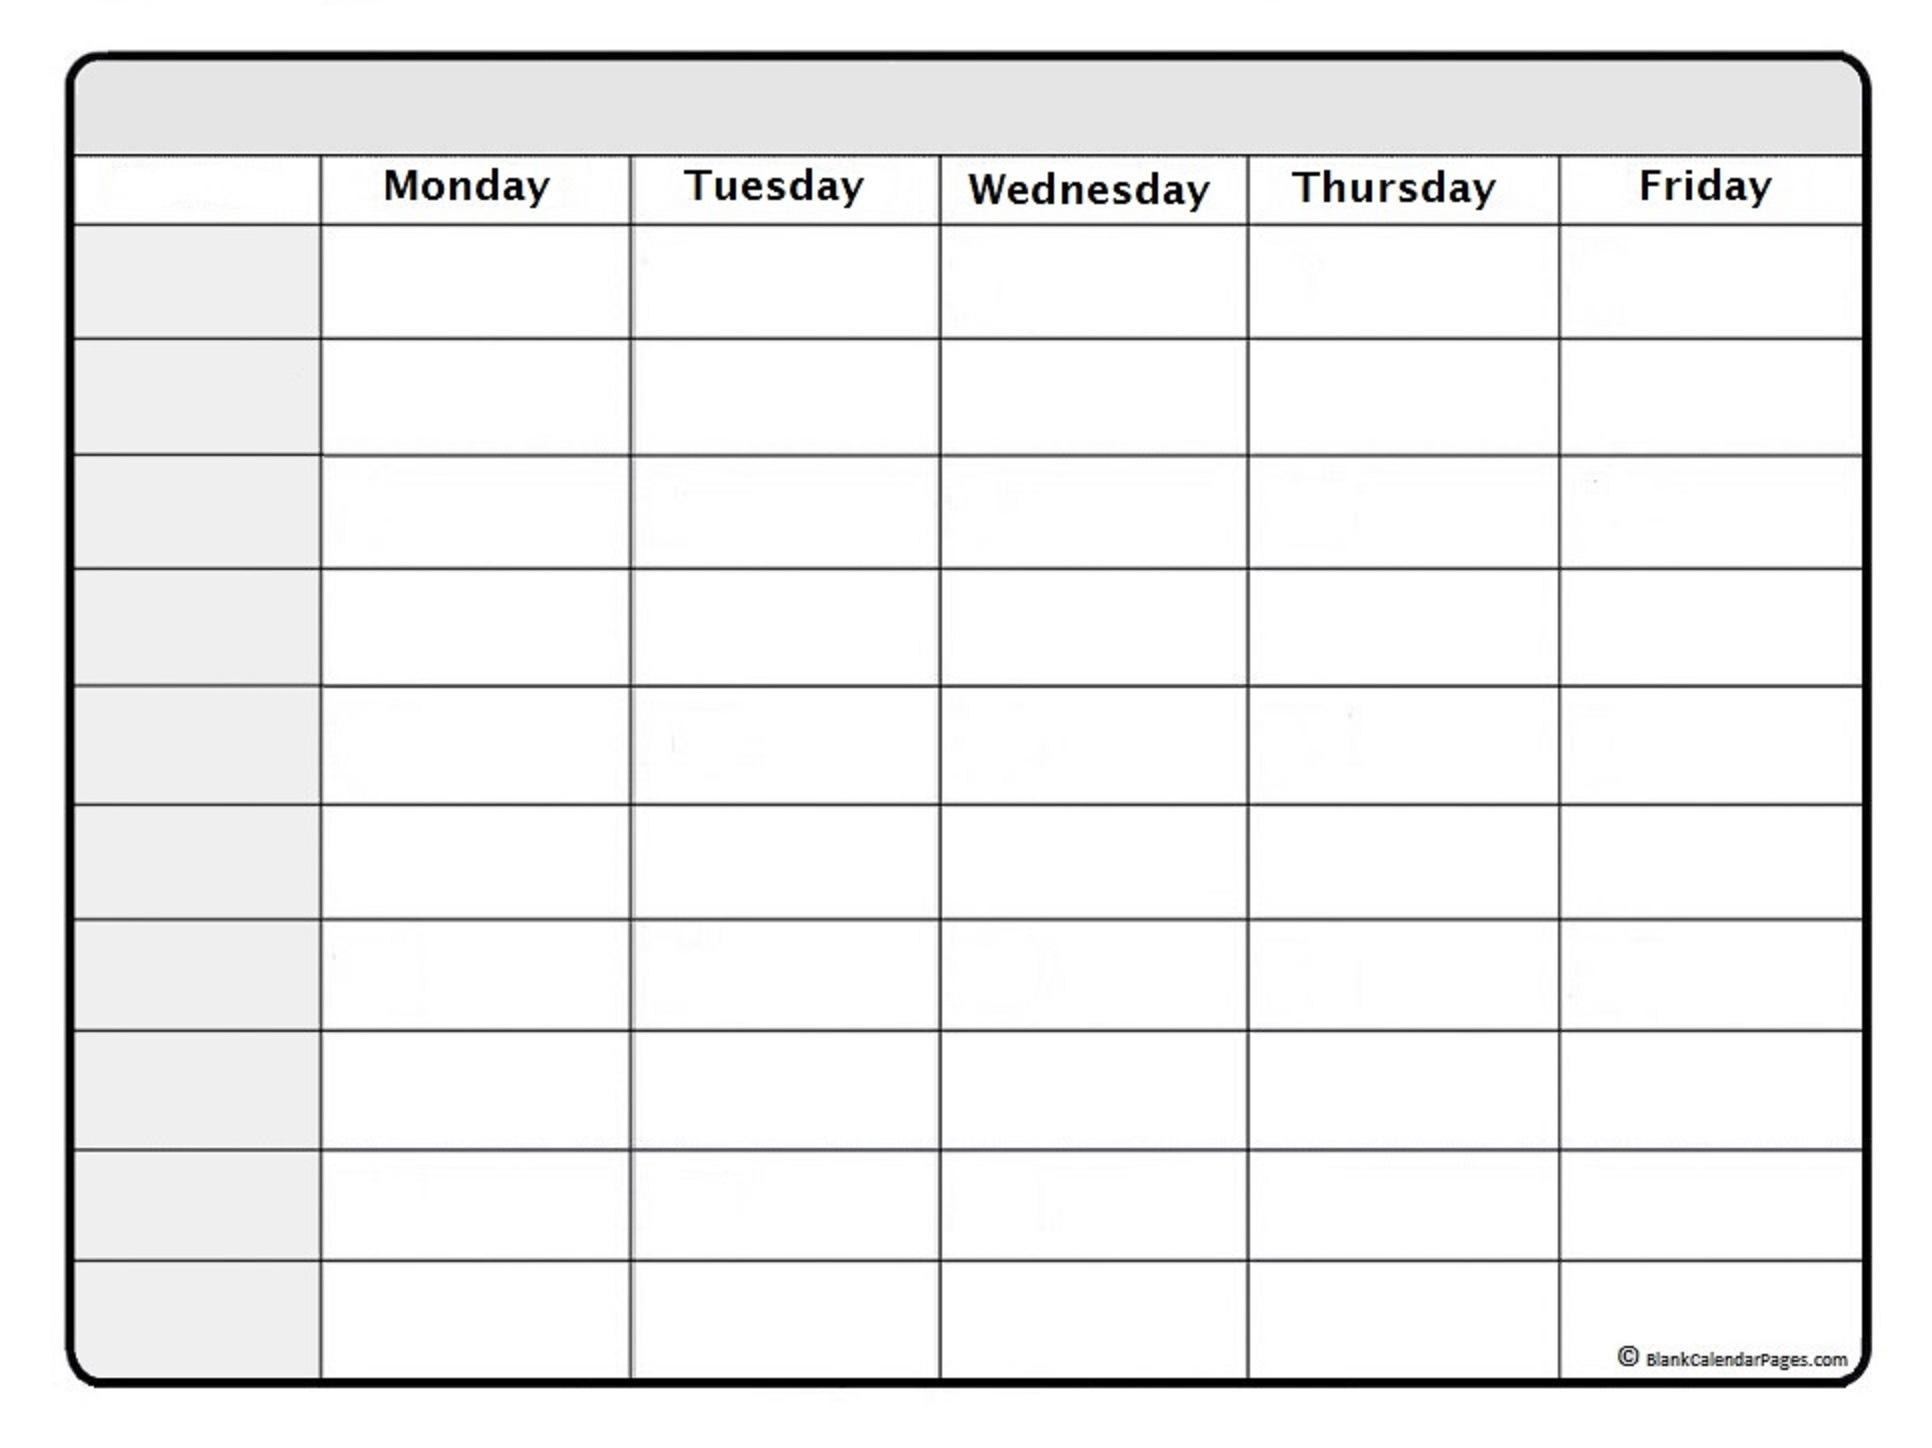 February 2021 Weekly Calendar   February 2021 Weekly 7 Day Calendar Template Free